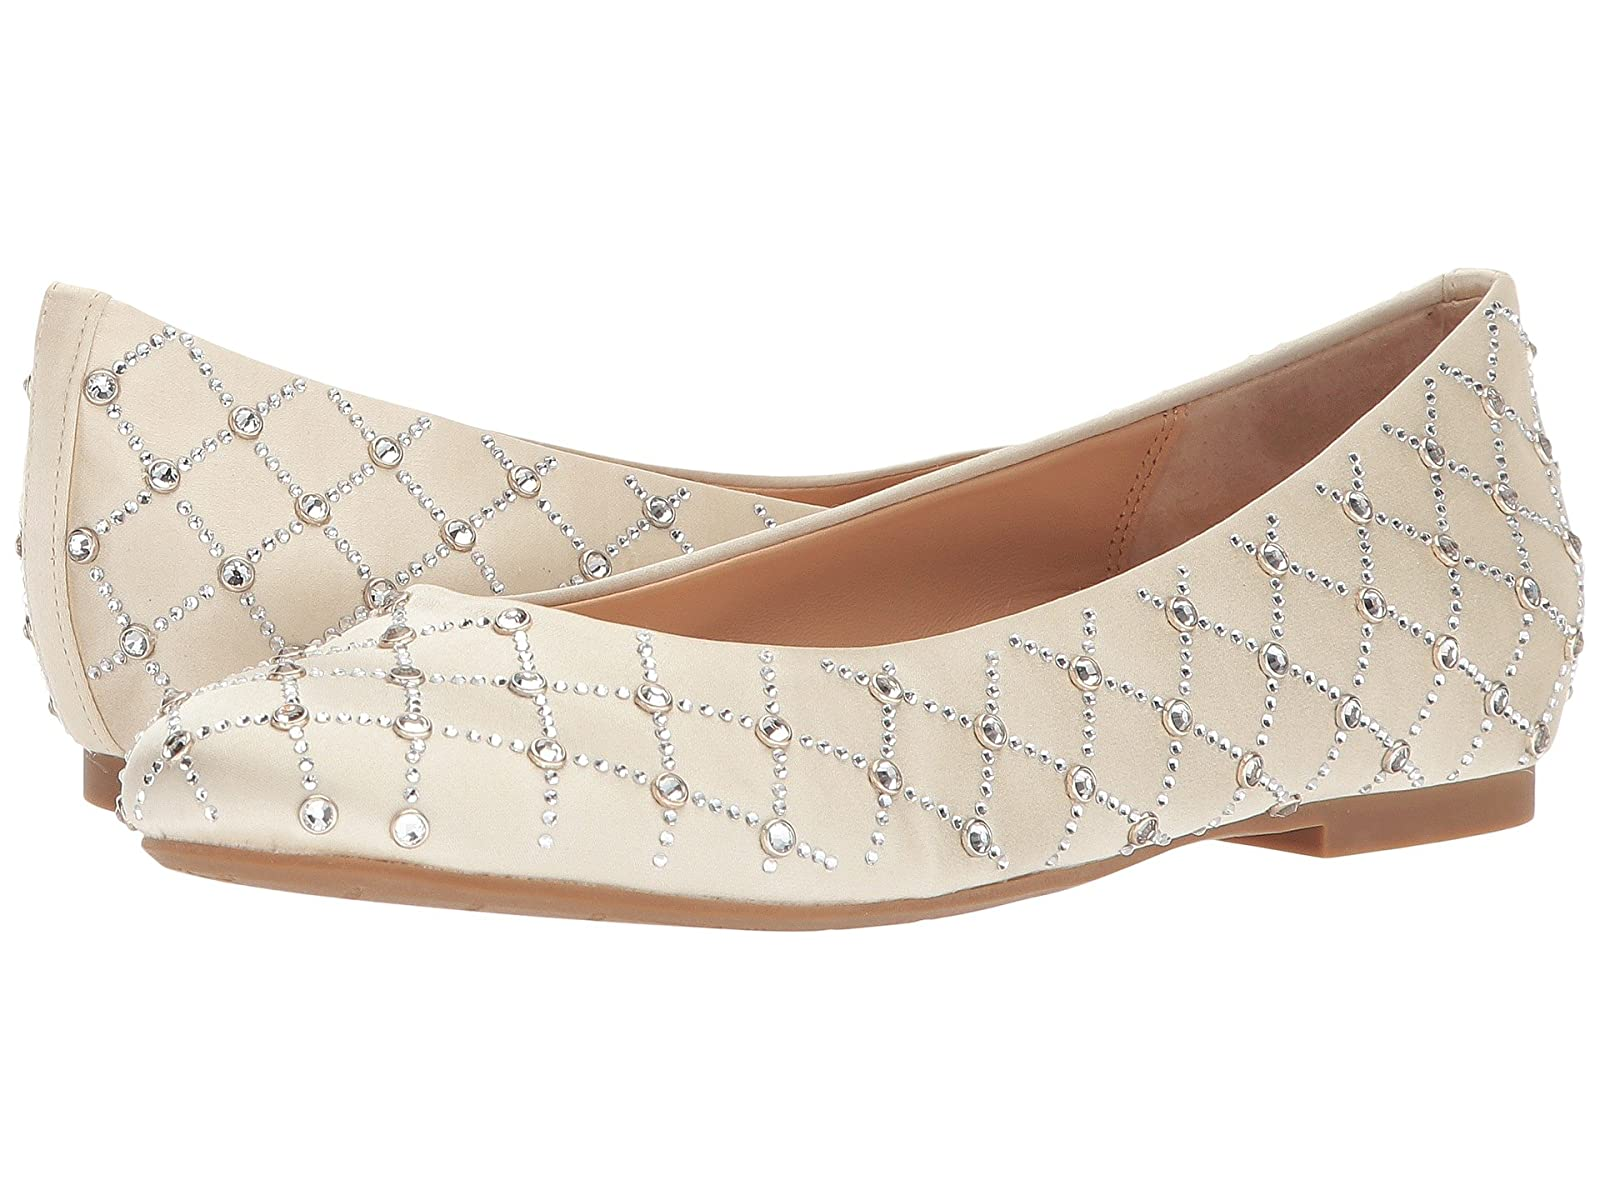 Badgley Mischka SheilaCheap and distinctive eye-catching shoes